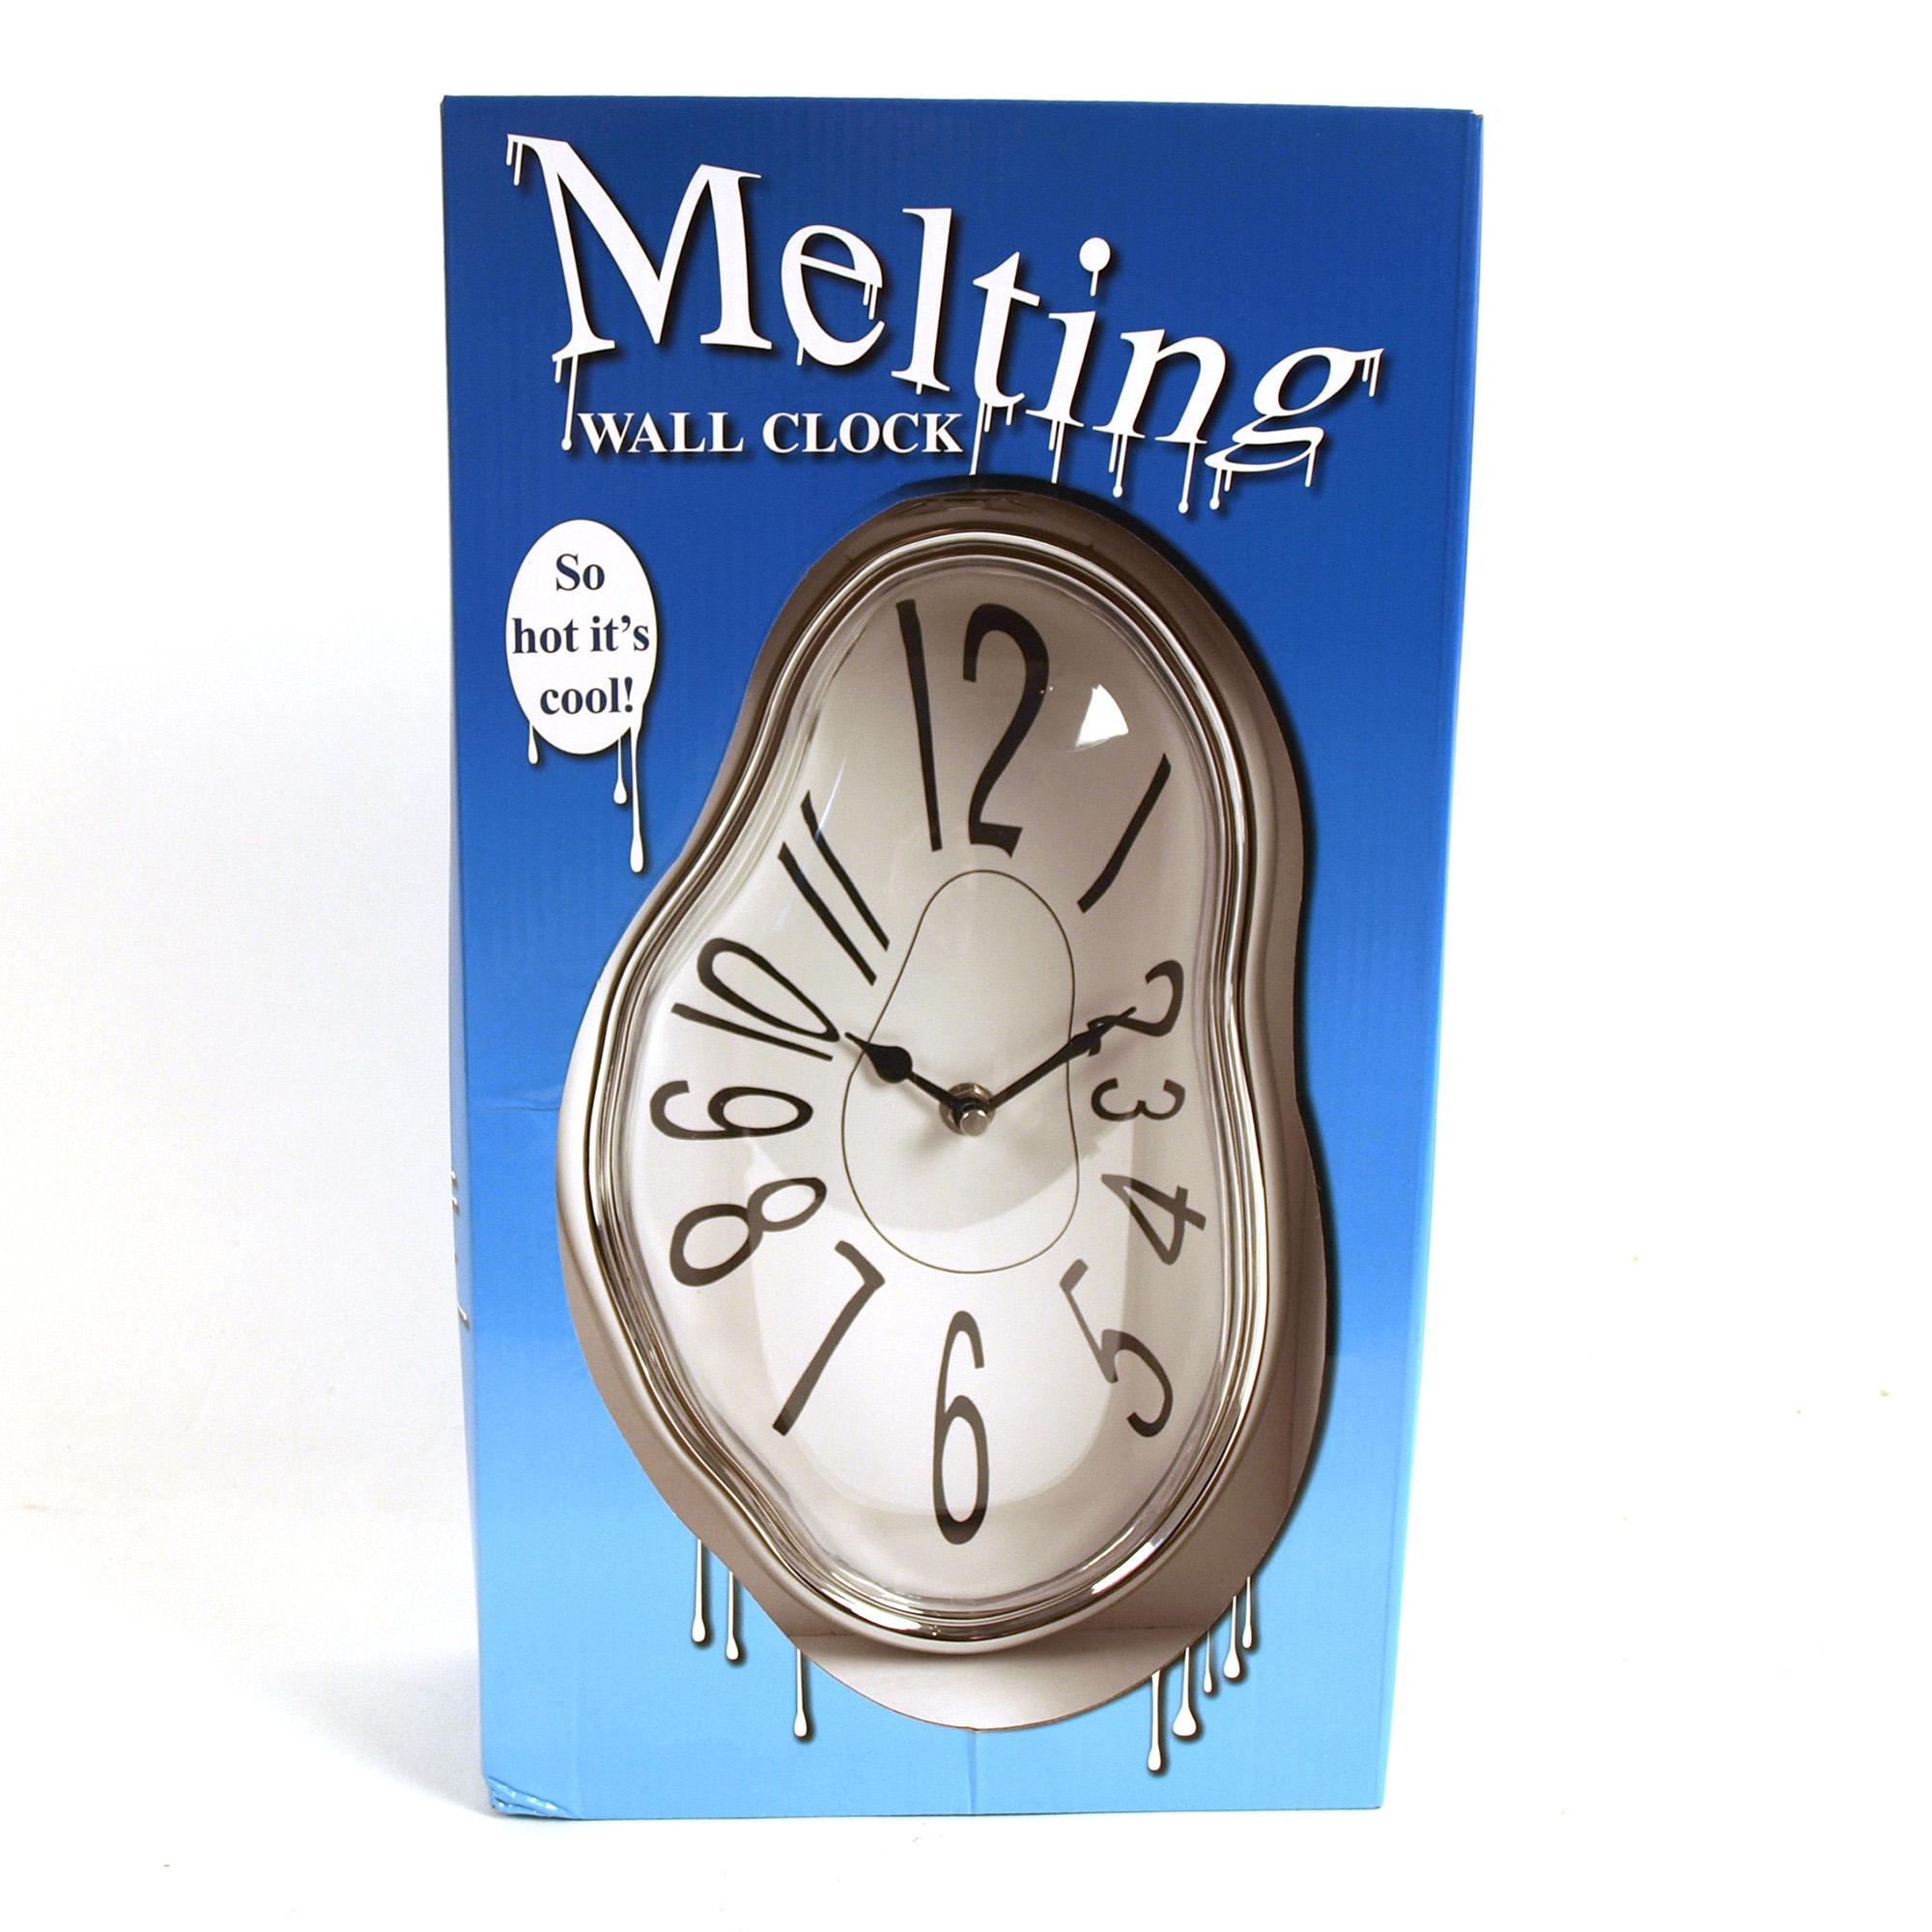 Dali Melting Wall Clock Ebay